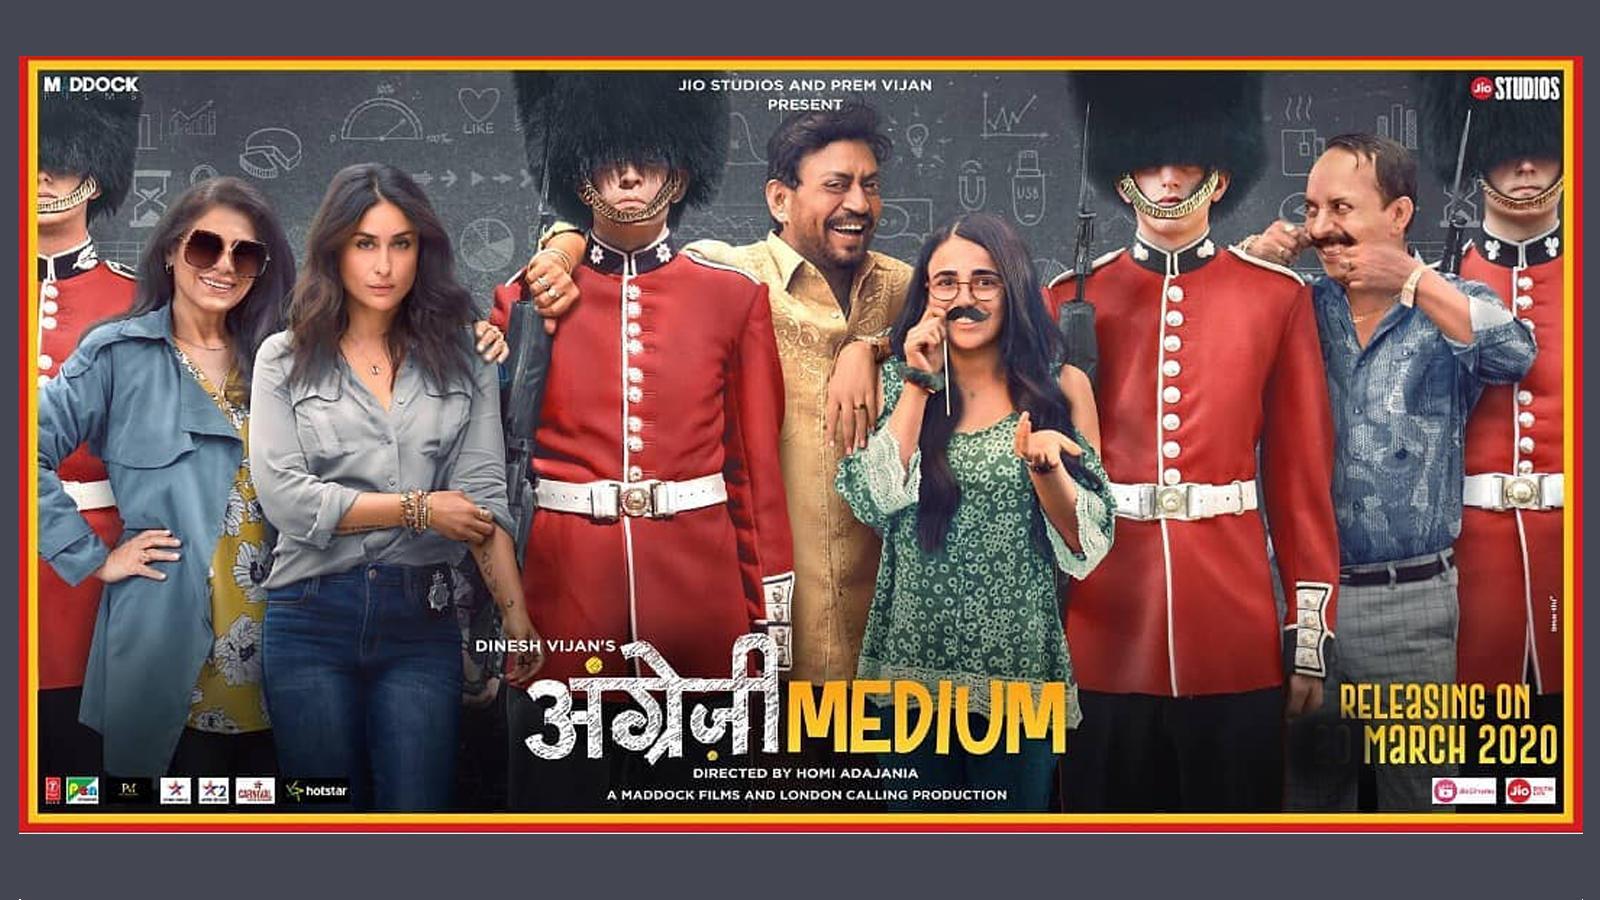 irrfan-khan-kareena-kapoor-khan-radhika-madan-starrer-angrezi-medium-get-new-release-date